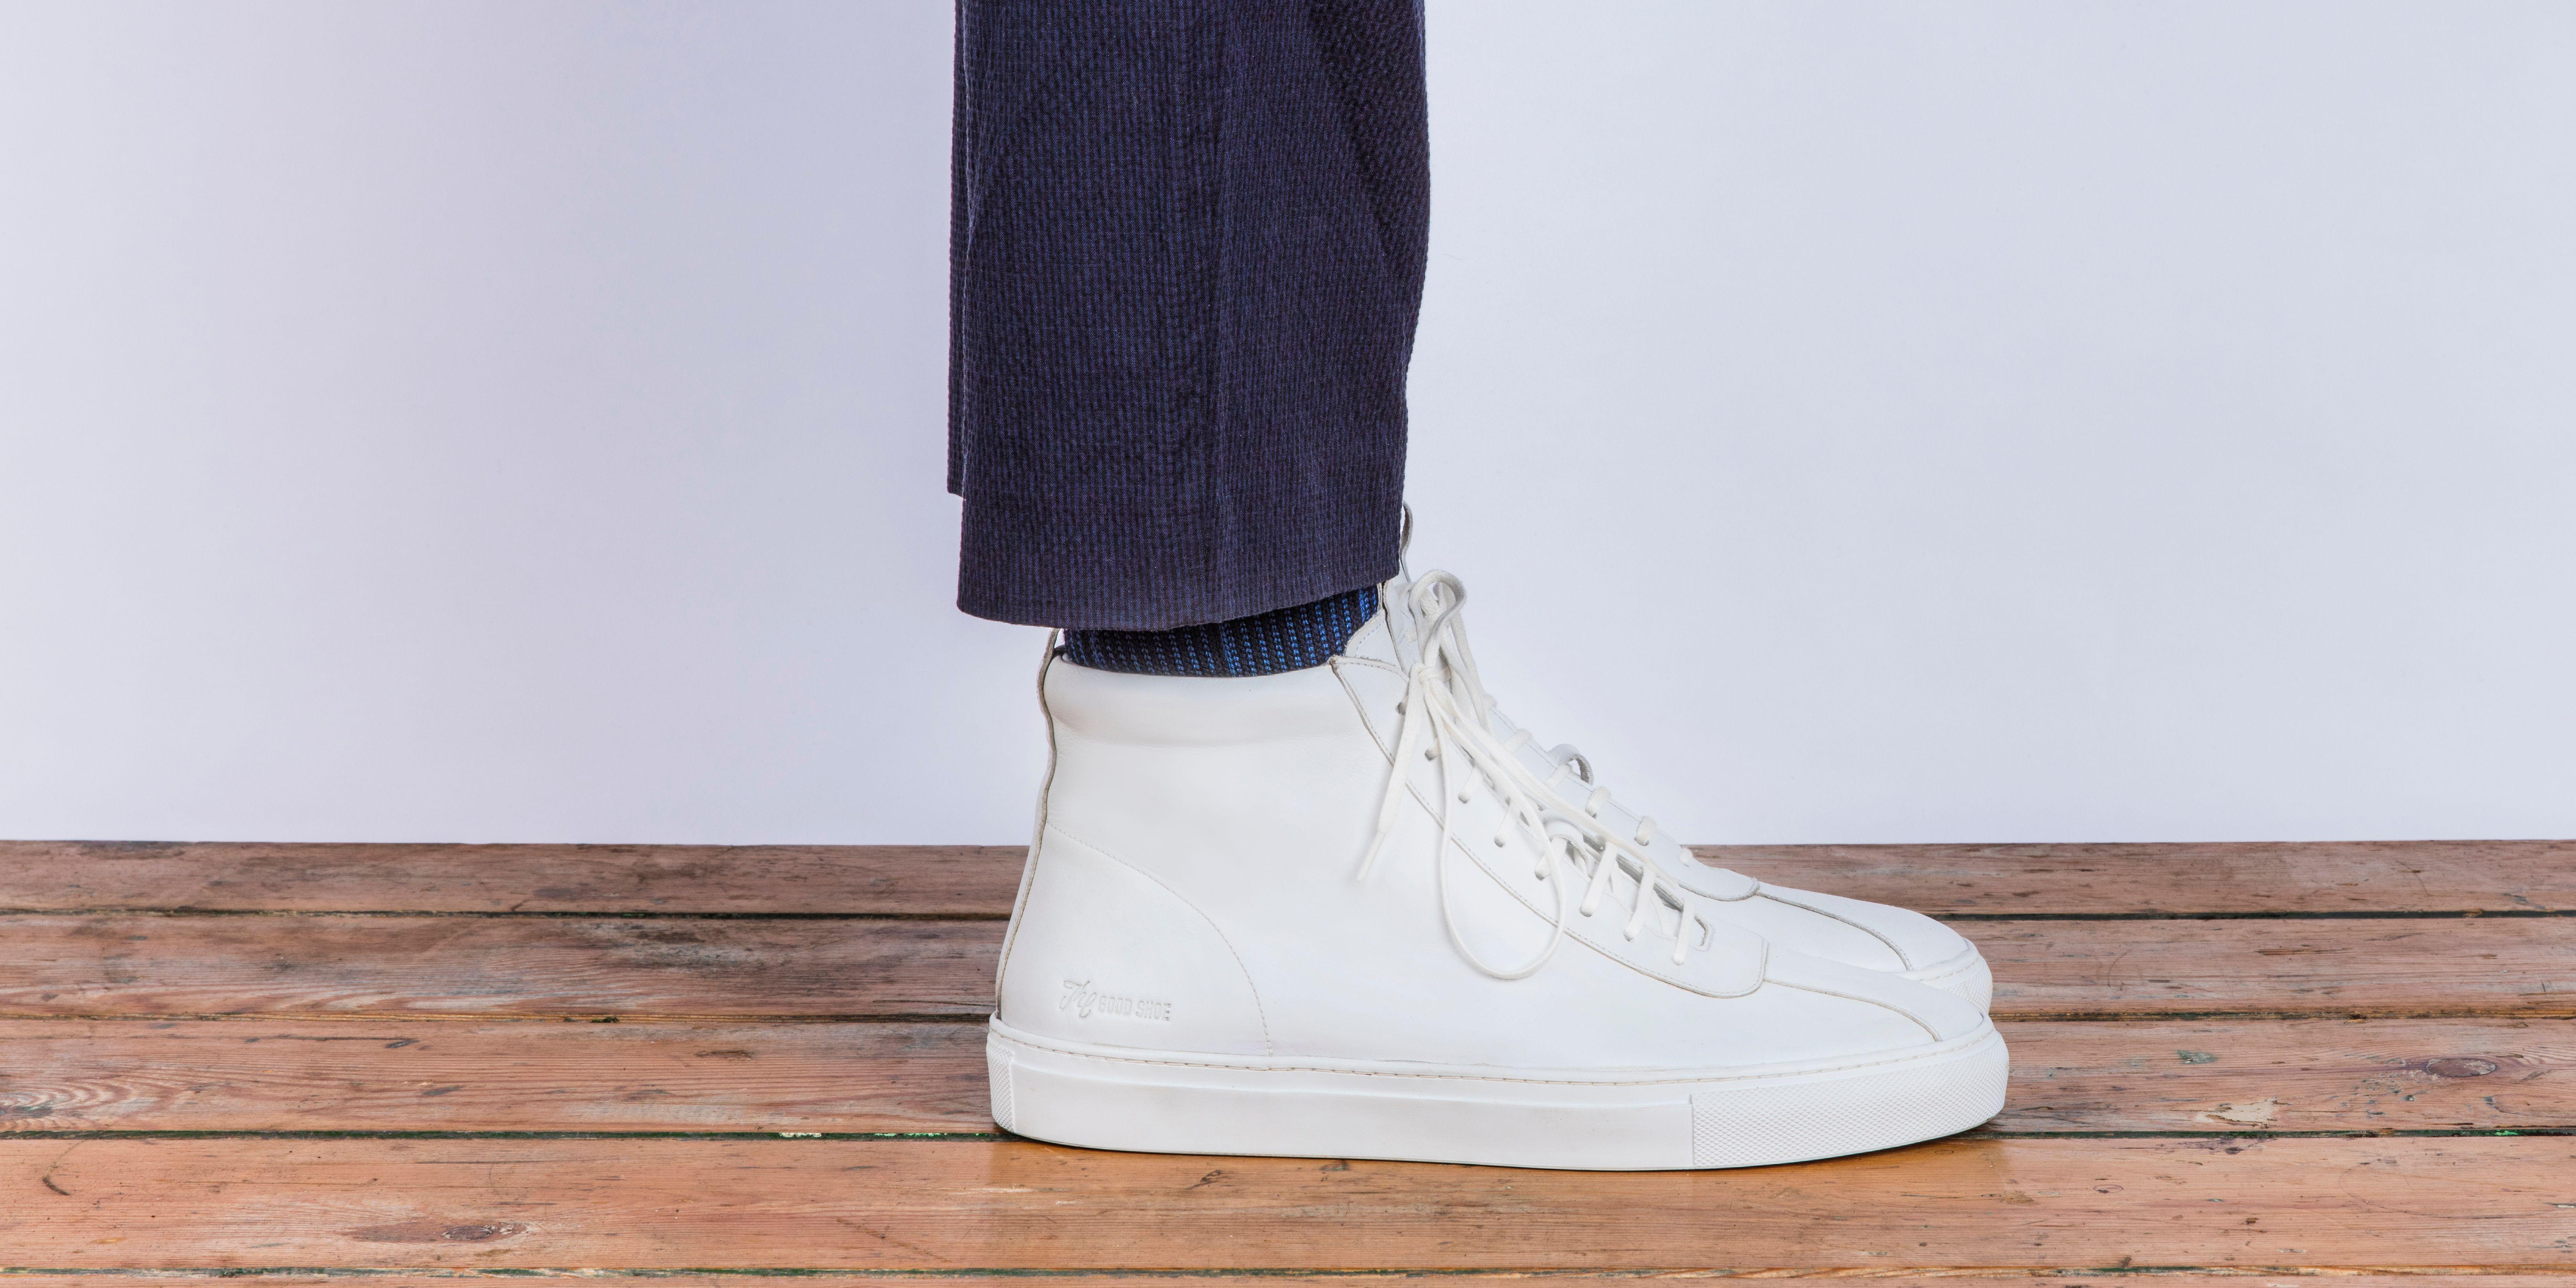 Sneaker 6 in White Calf   Sneakers, Top